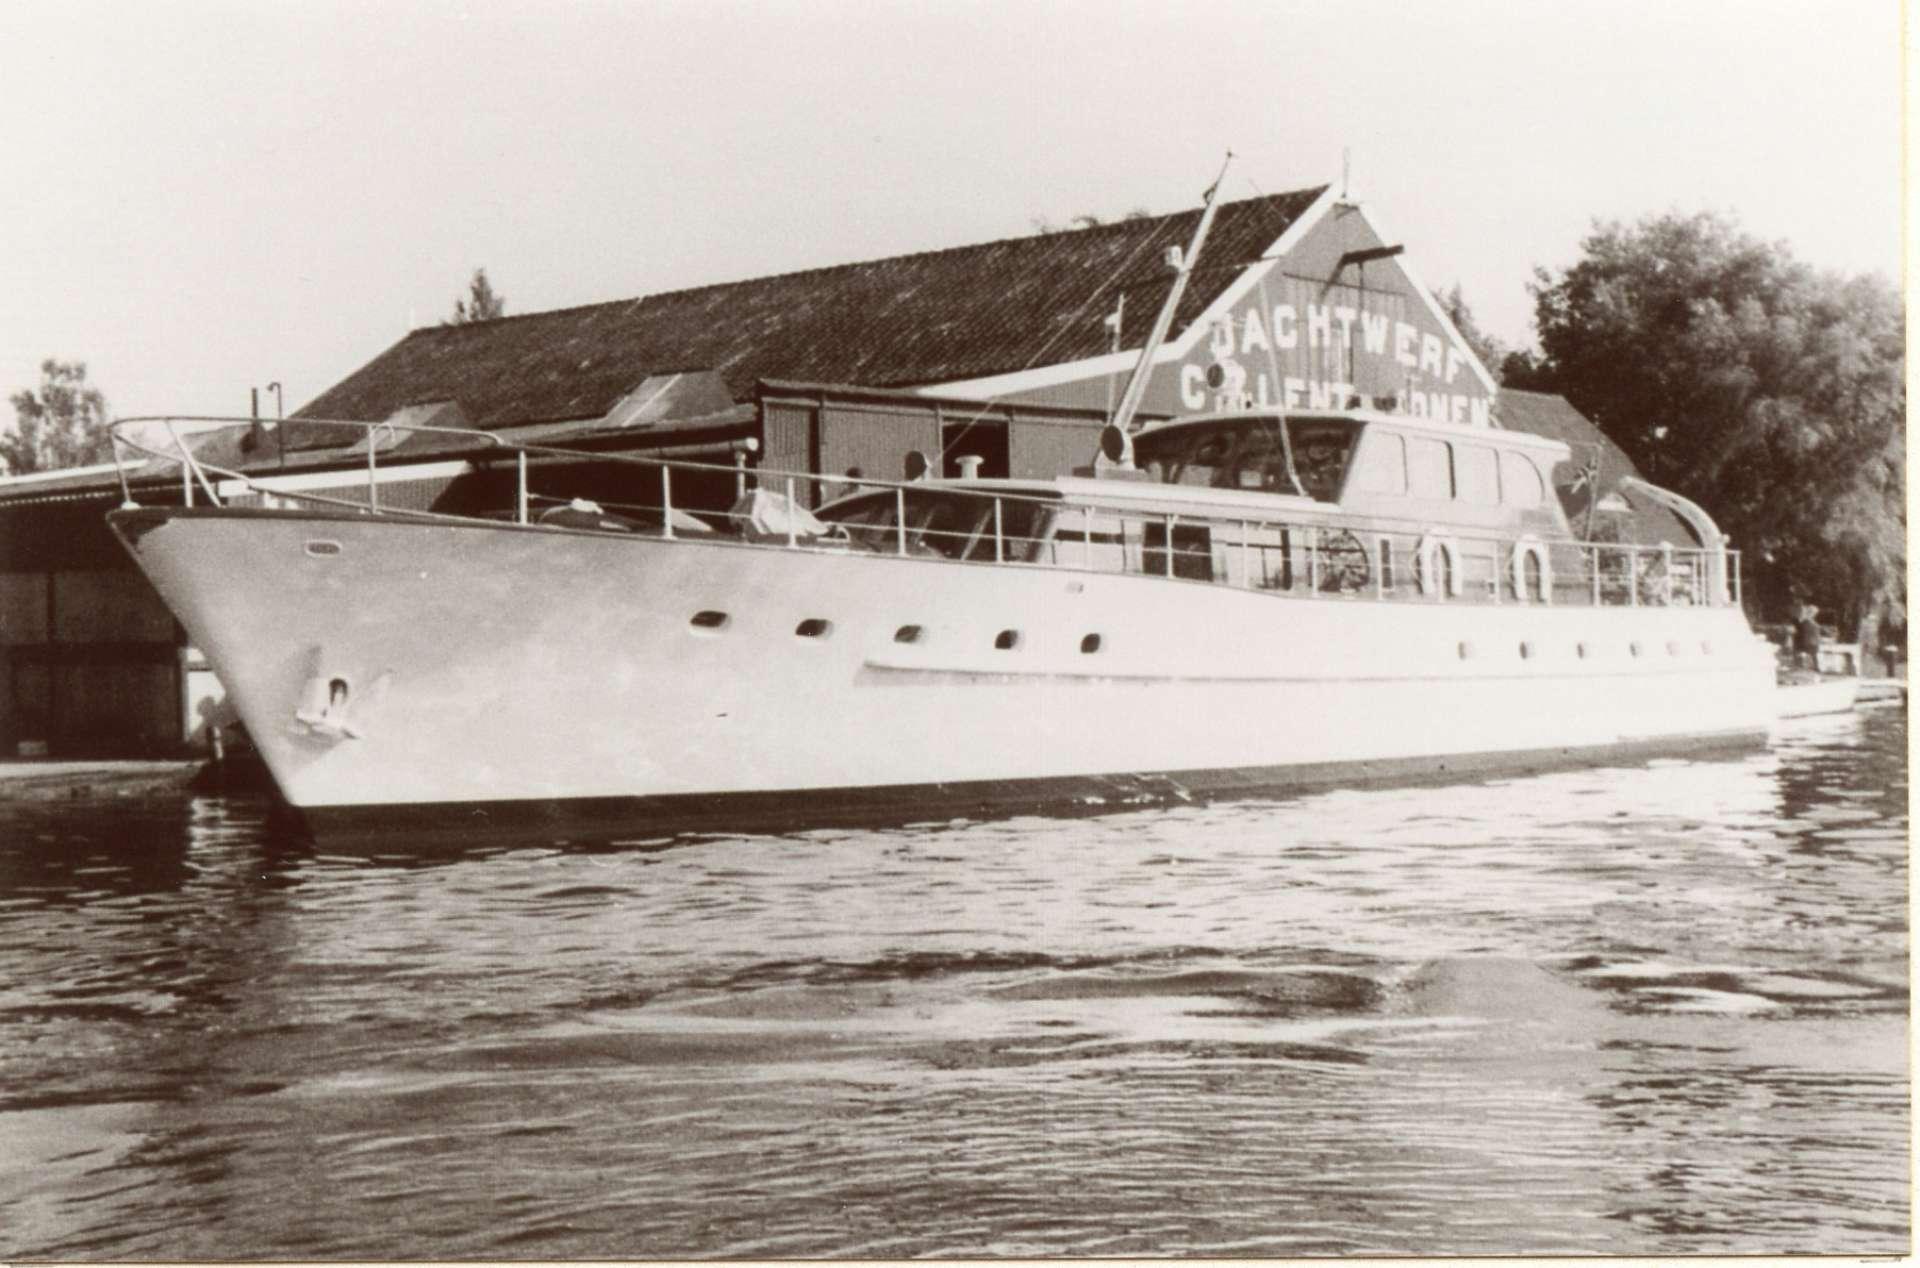 Gladys Rose III